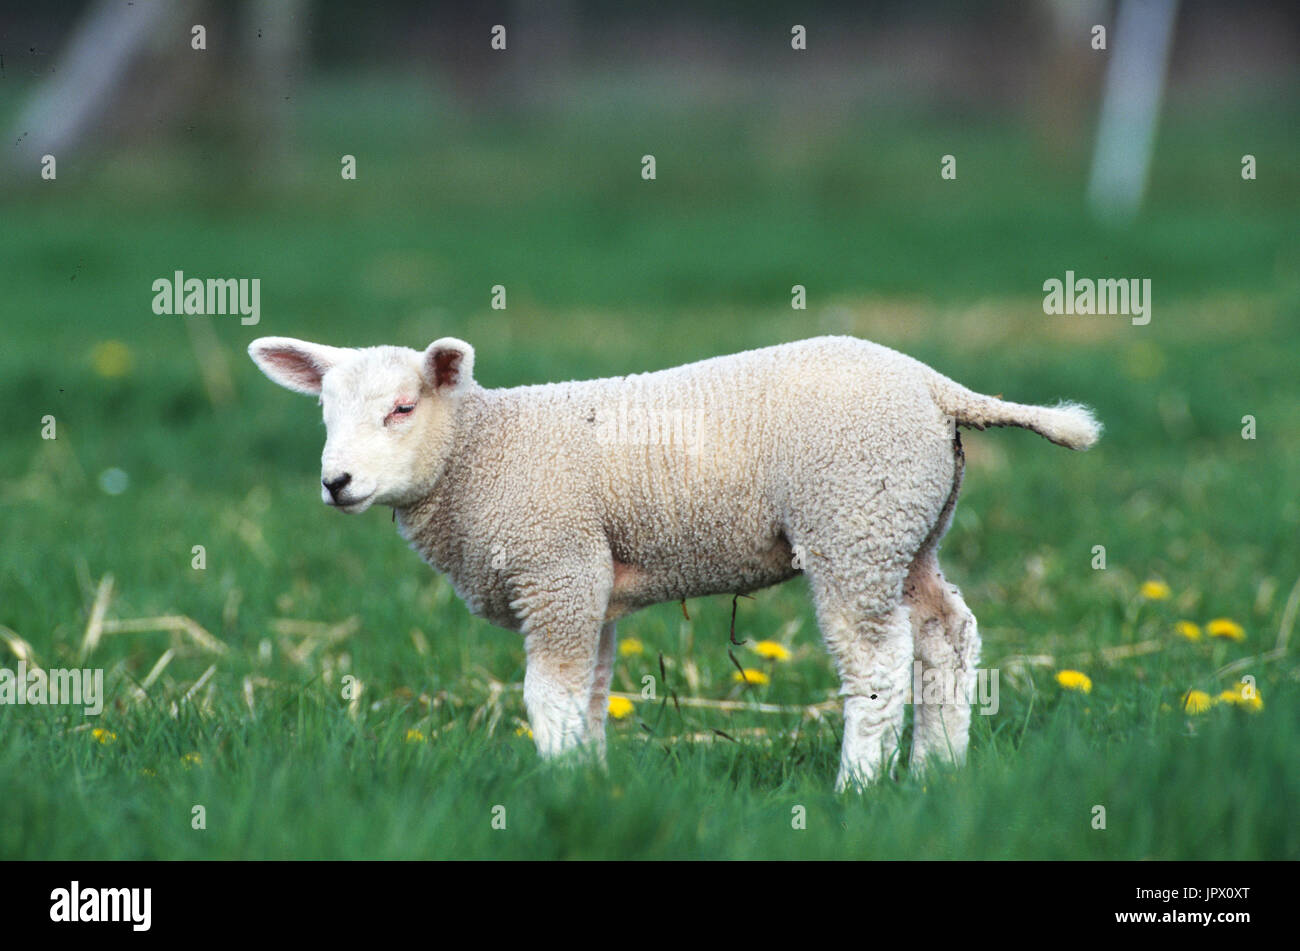 Lamb - Stock Image